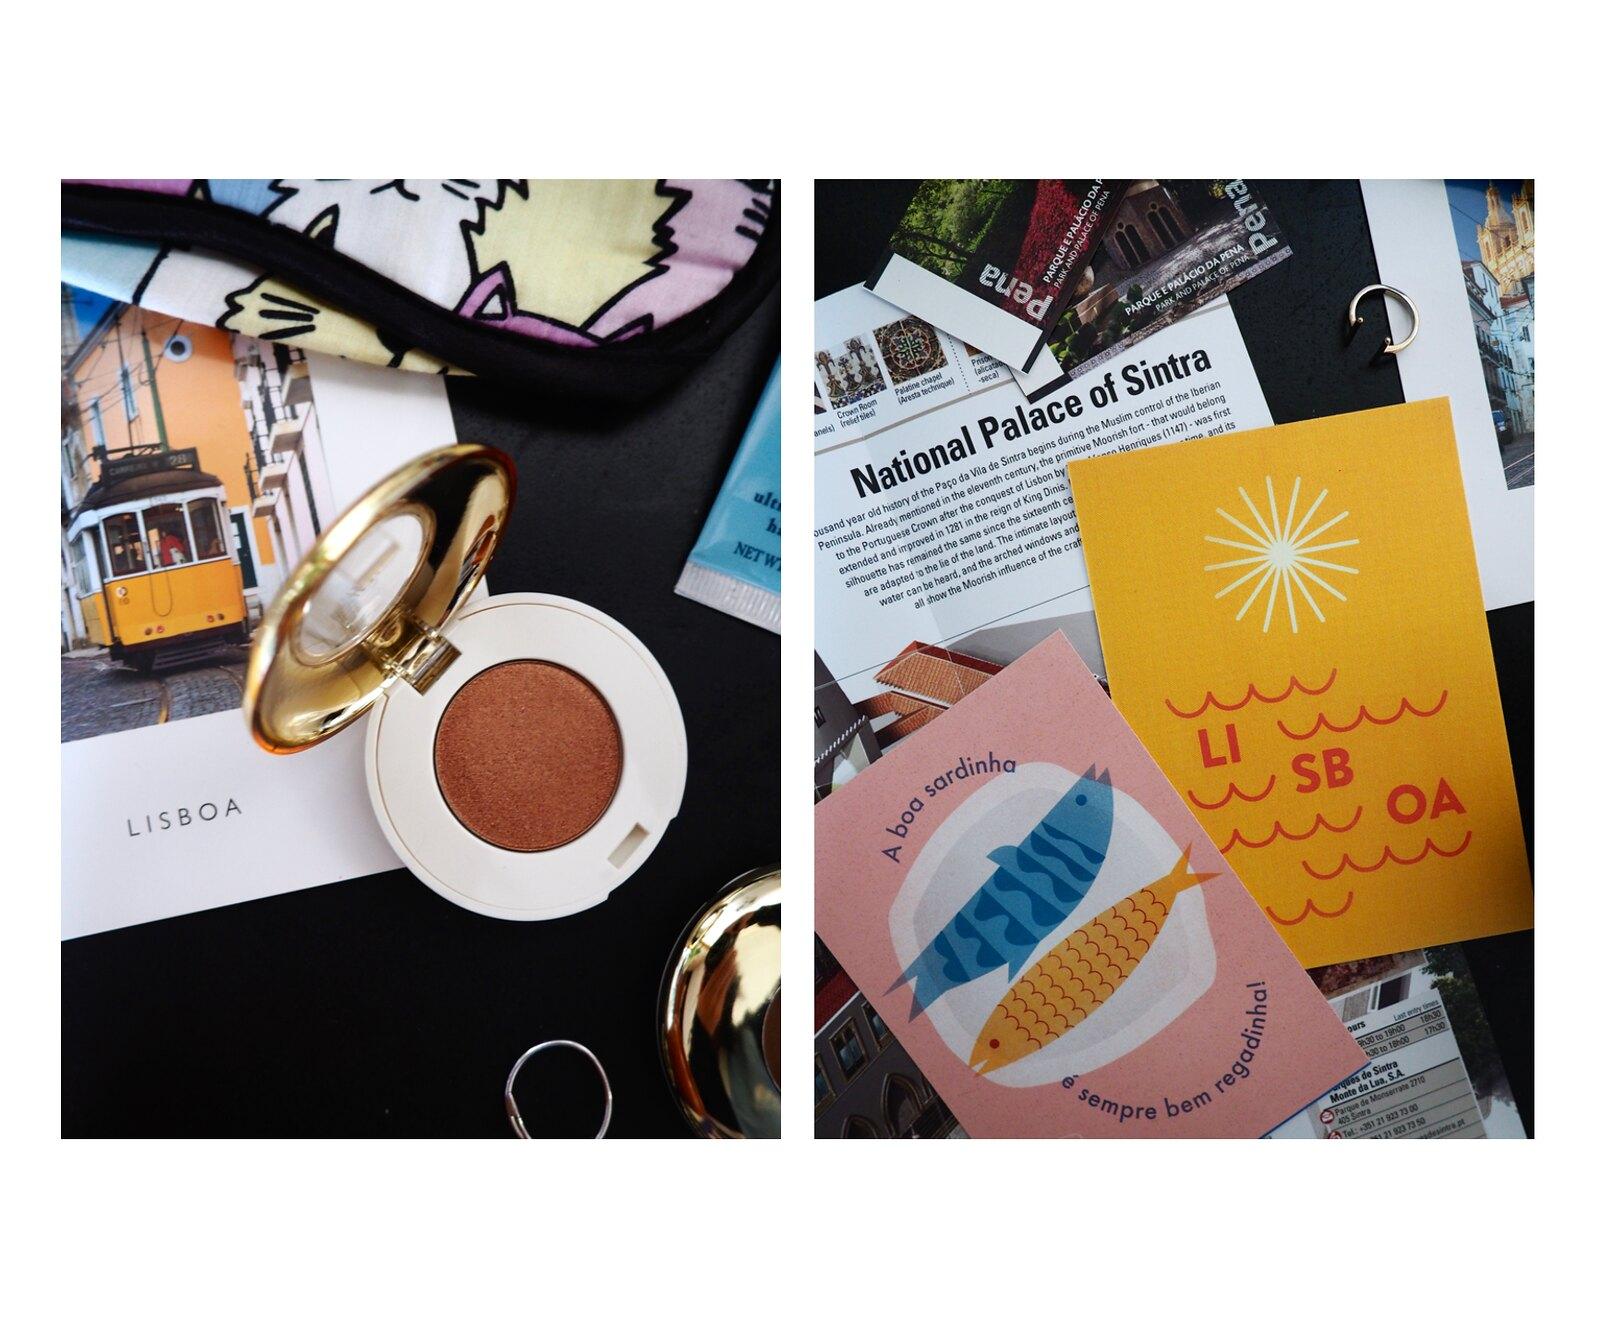 lisbon-haul-hm-makeup-travel-postcard-corrupting-miffy